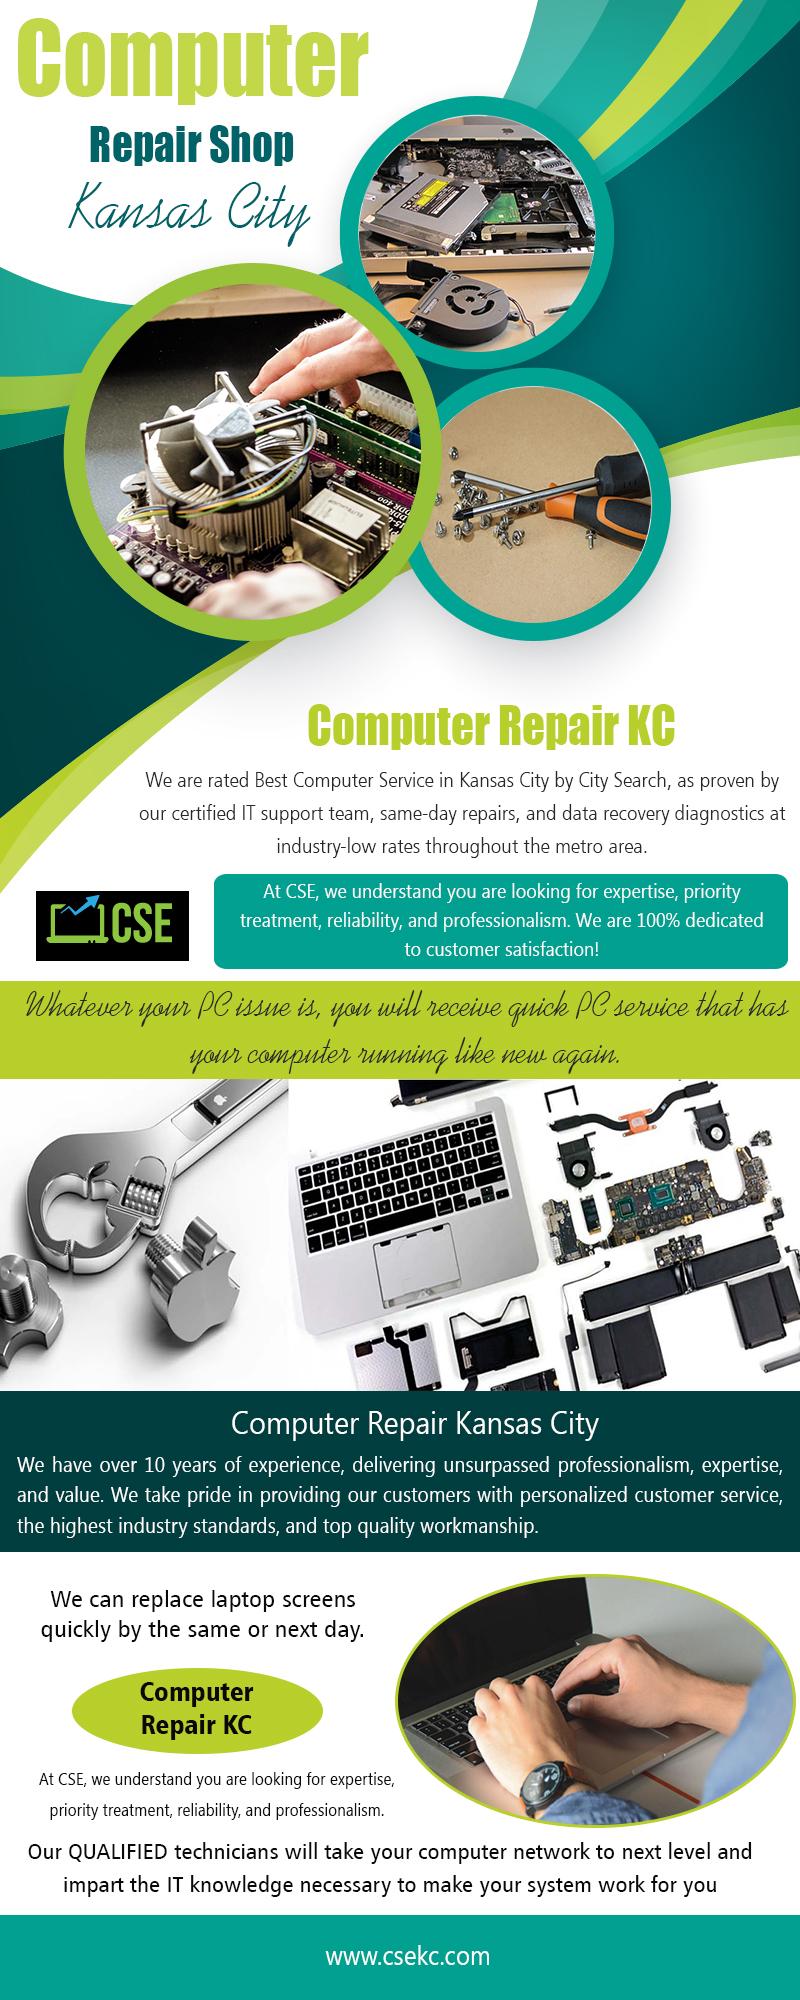 Computer Repair Kansas City